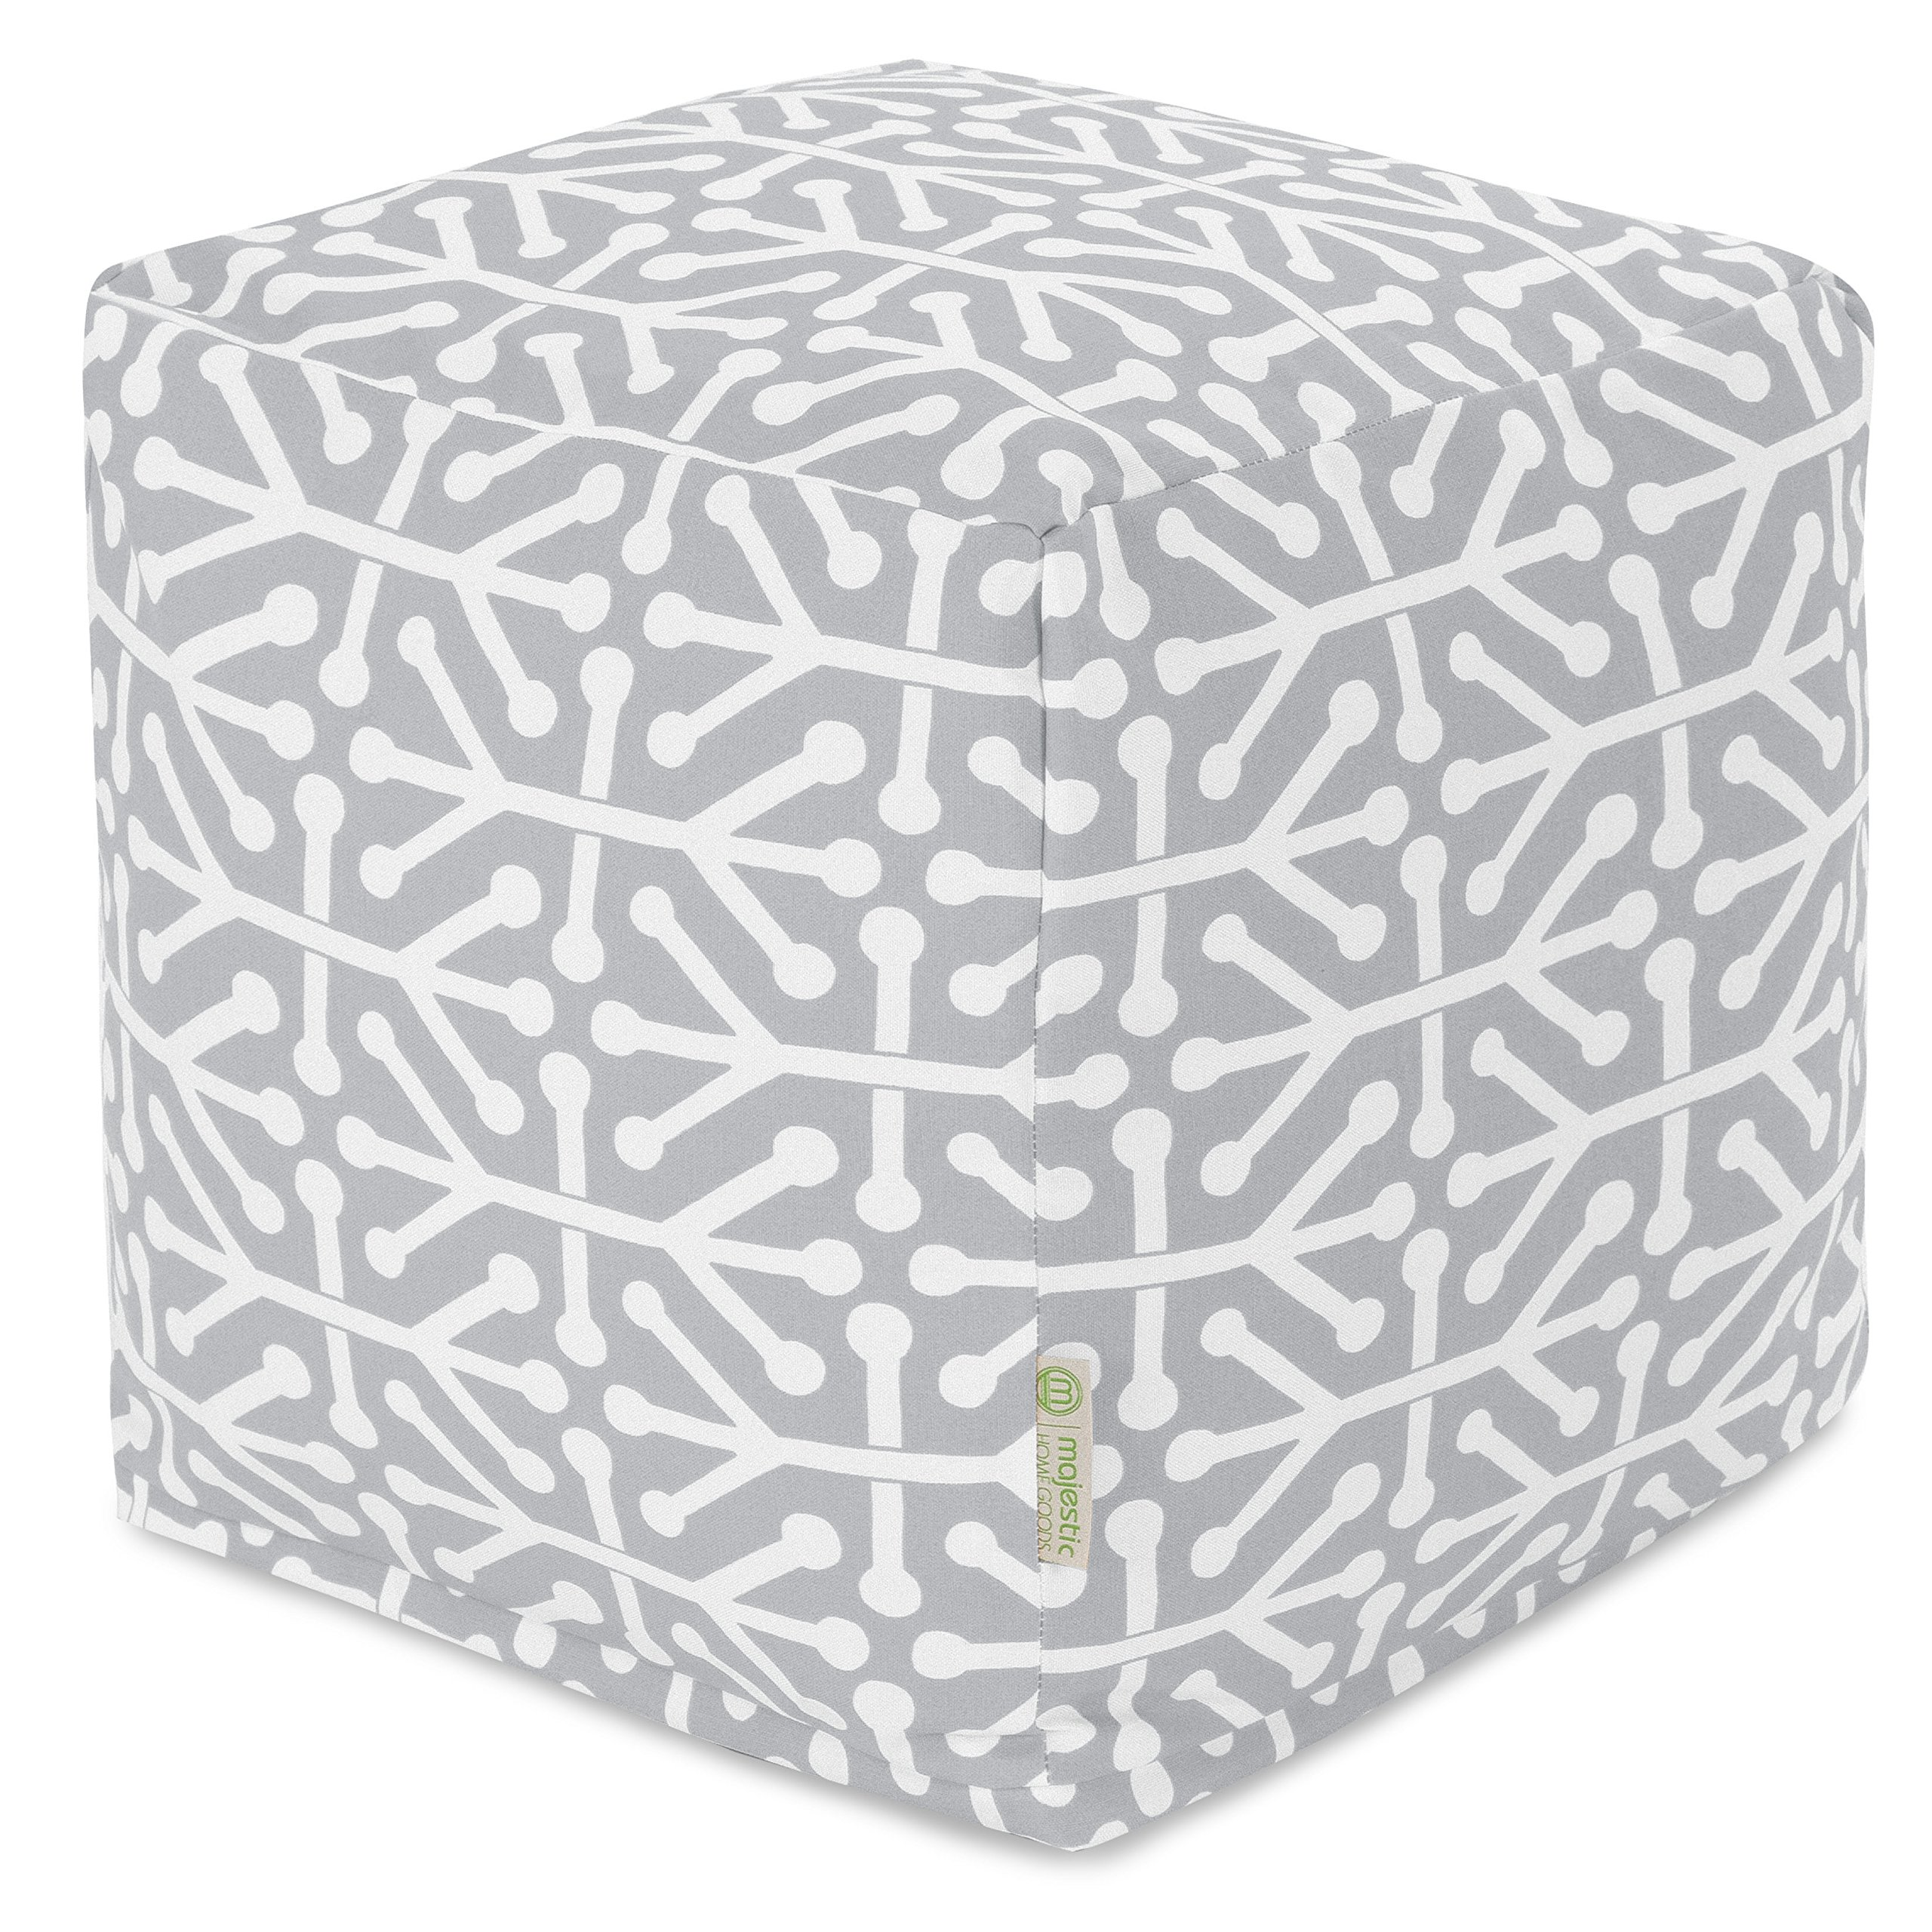 Majestic Home Goods Gray Aruba Indoor/Outdoor Bean Bag Ottoman Pouf Cube 17'' L x 17'' W x 17'' H